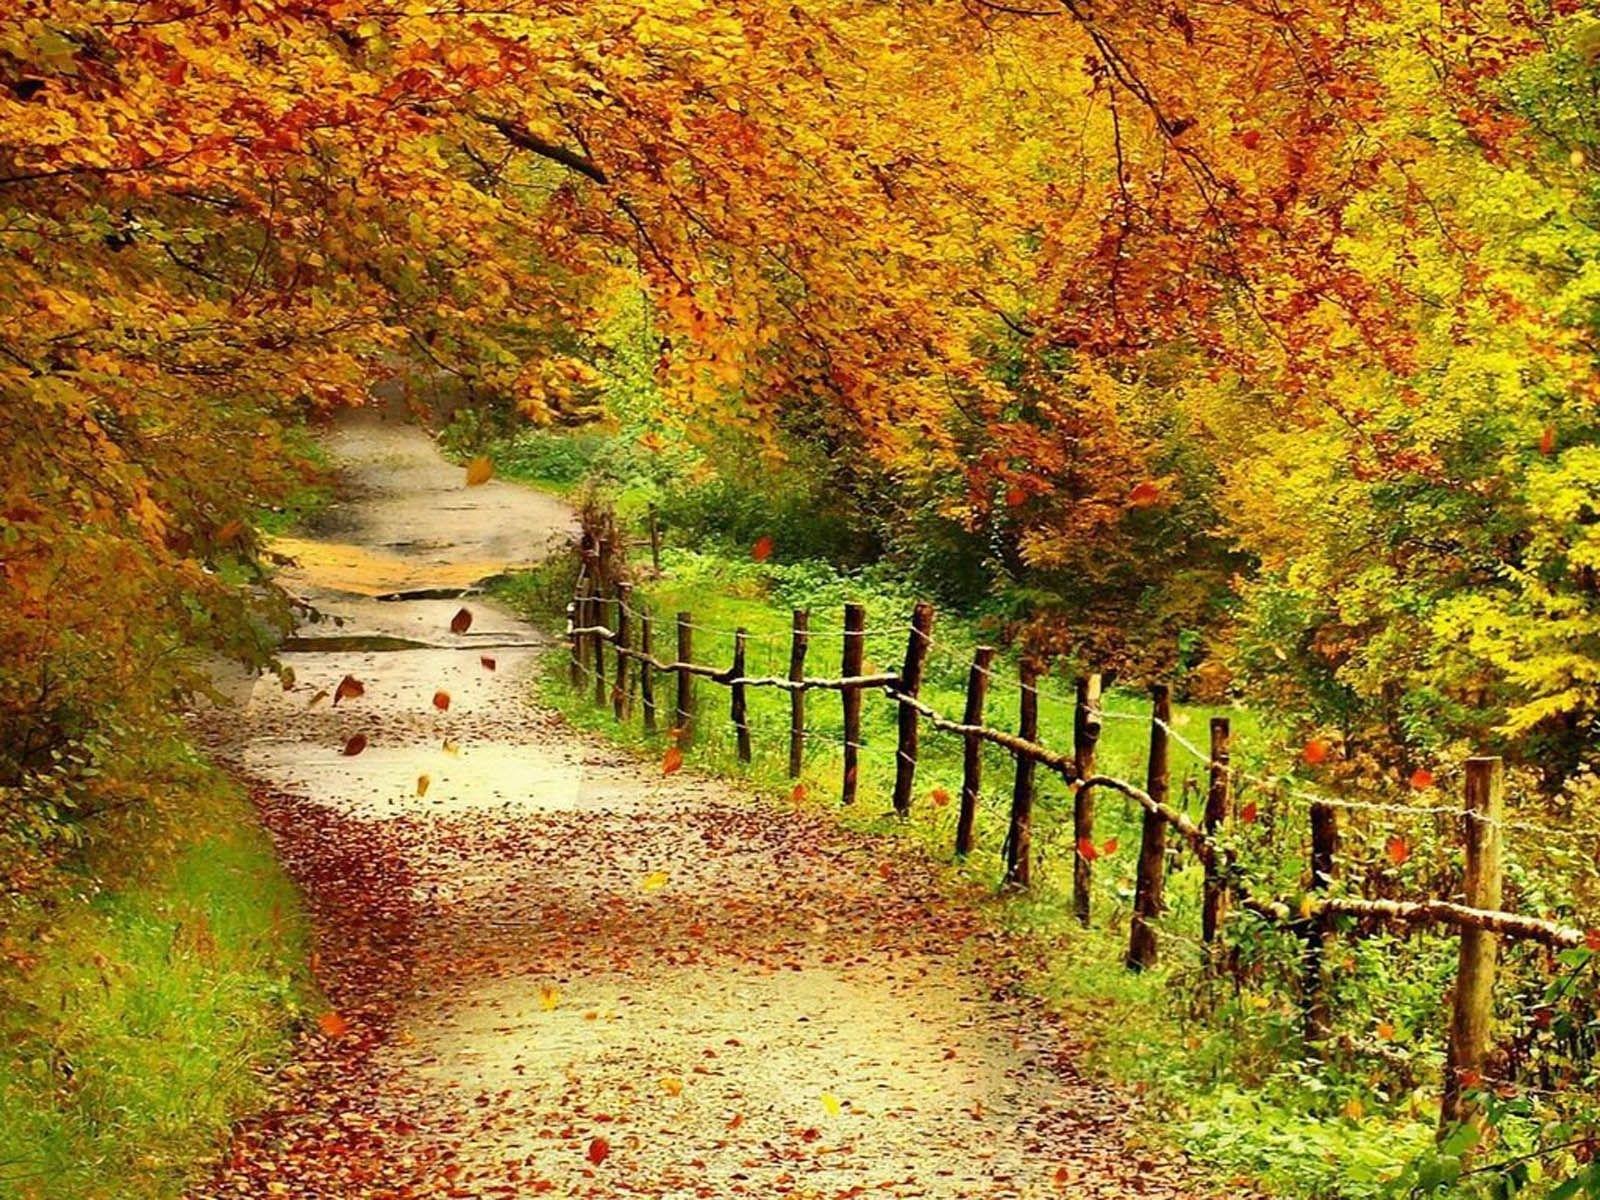 beautiful autumn scenery   tag: beautiful autumn scenery wallpapers